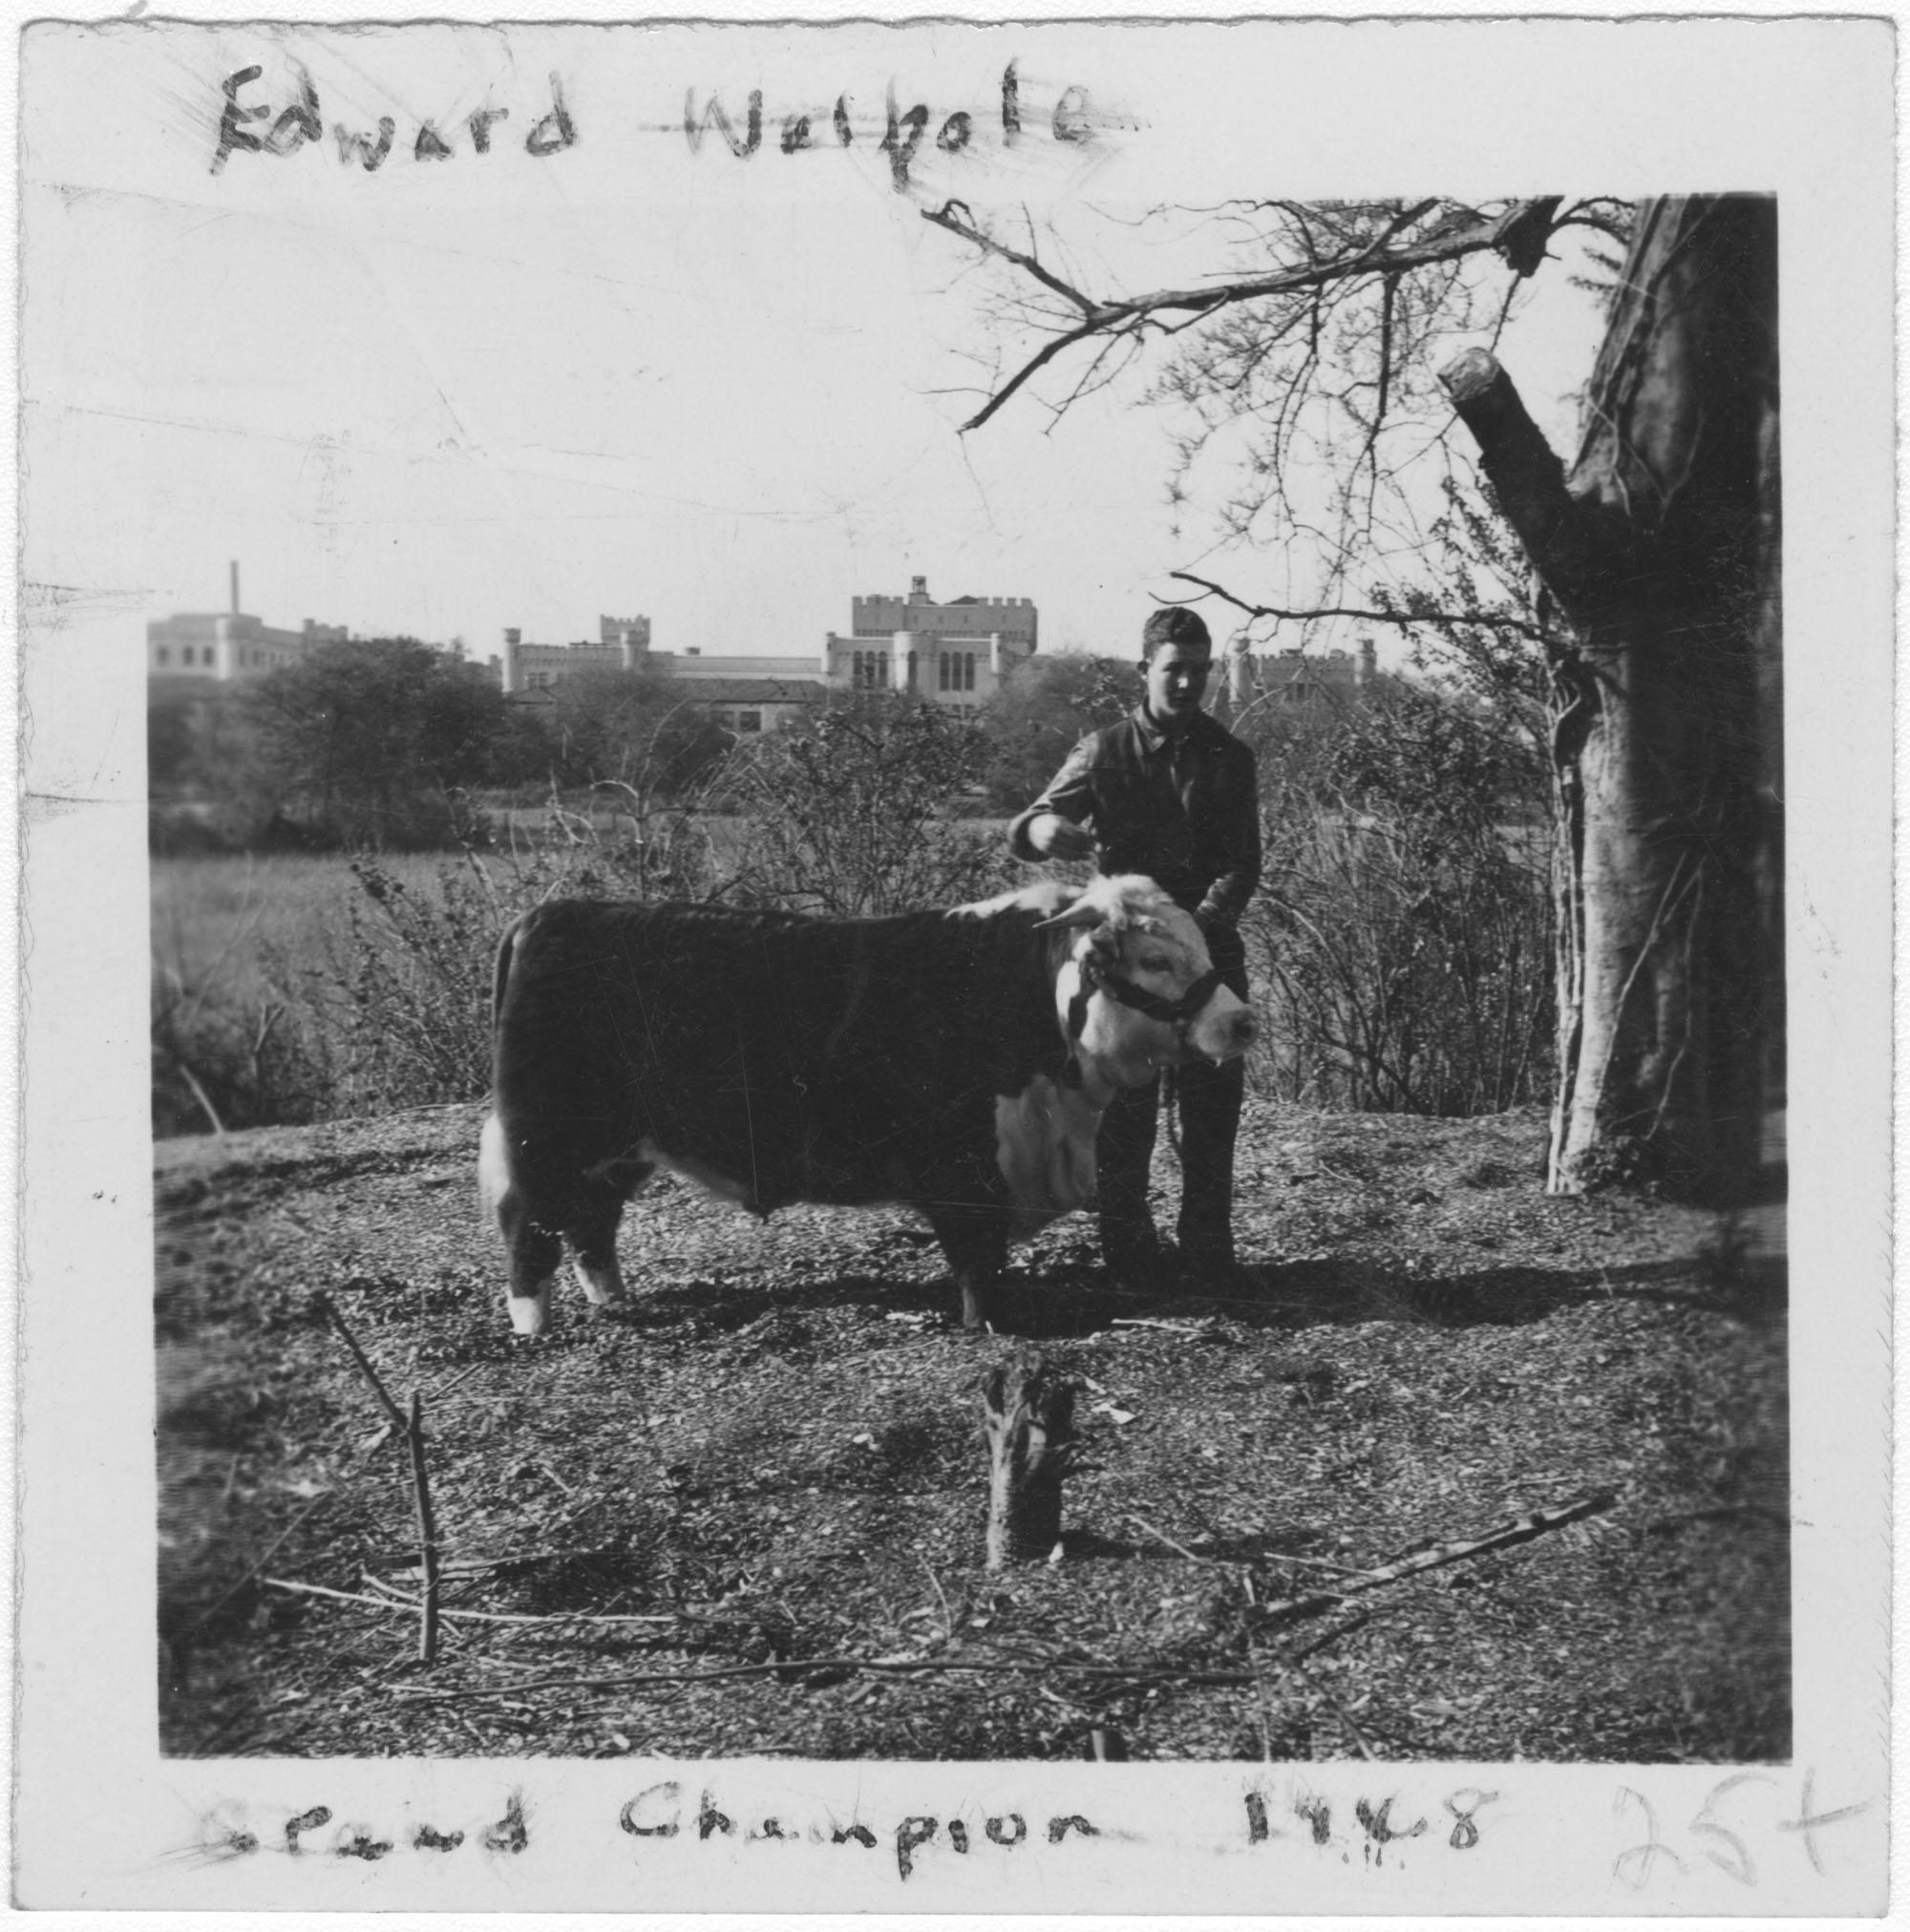 Edward Walpole with Champion Bull